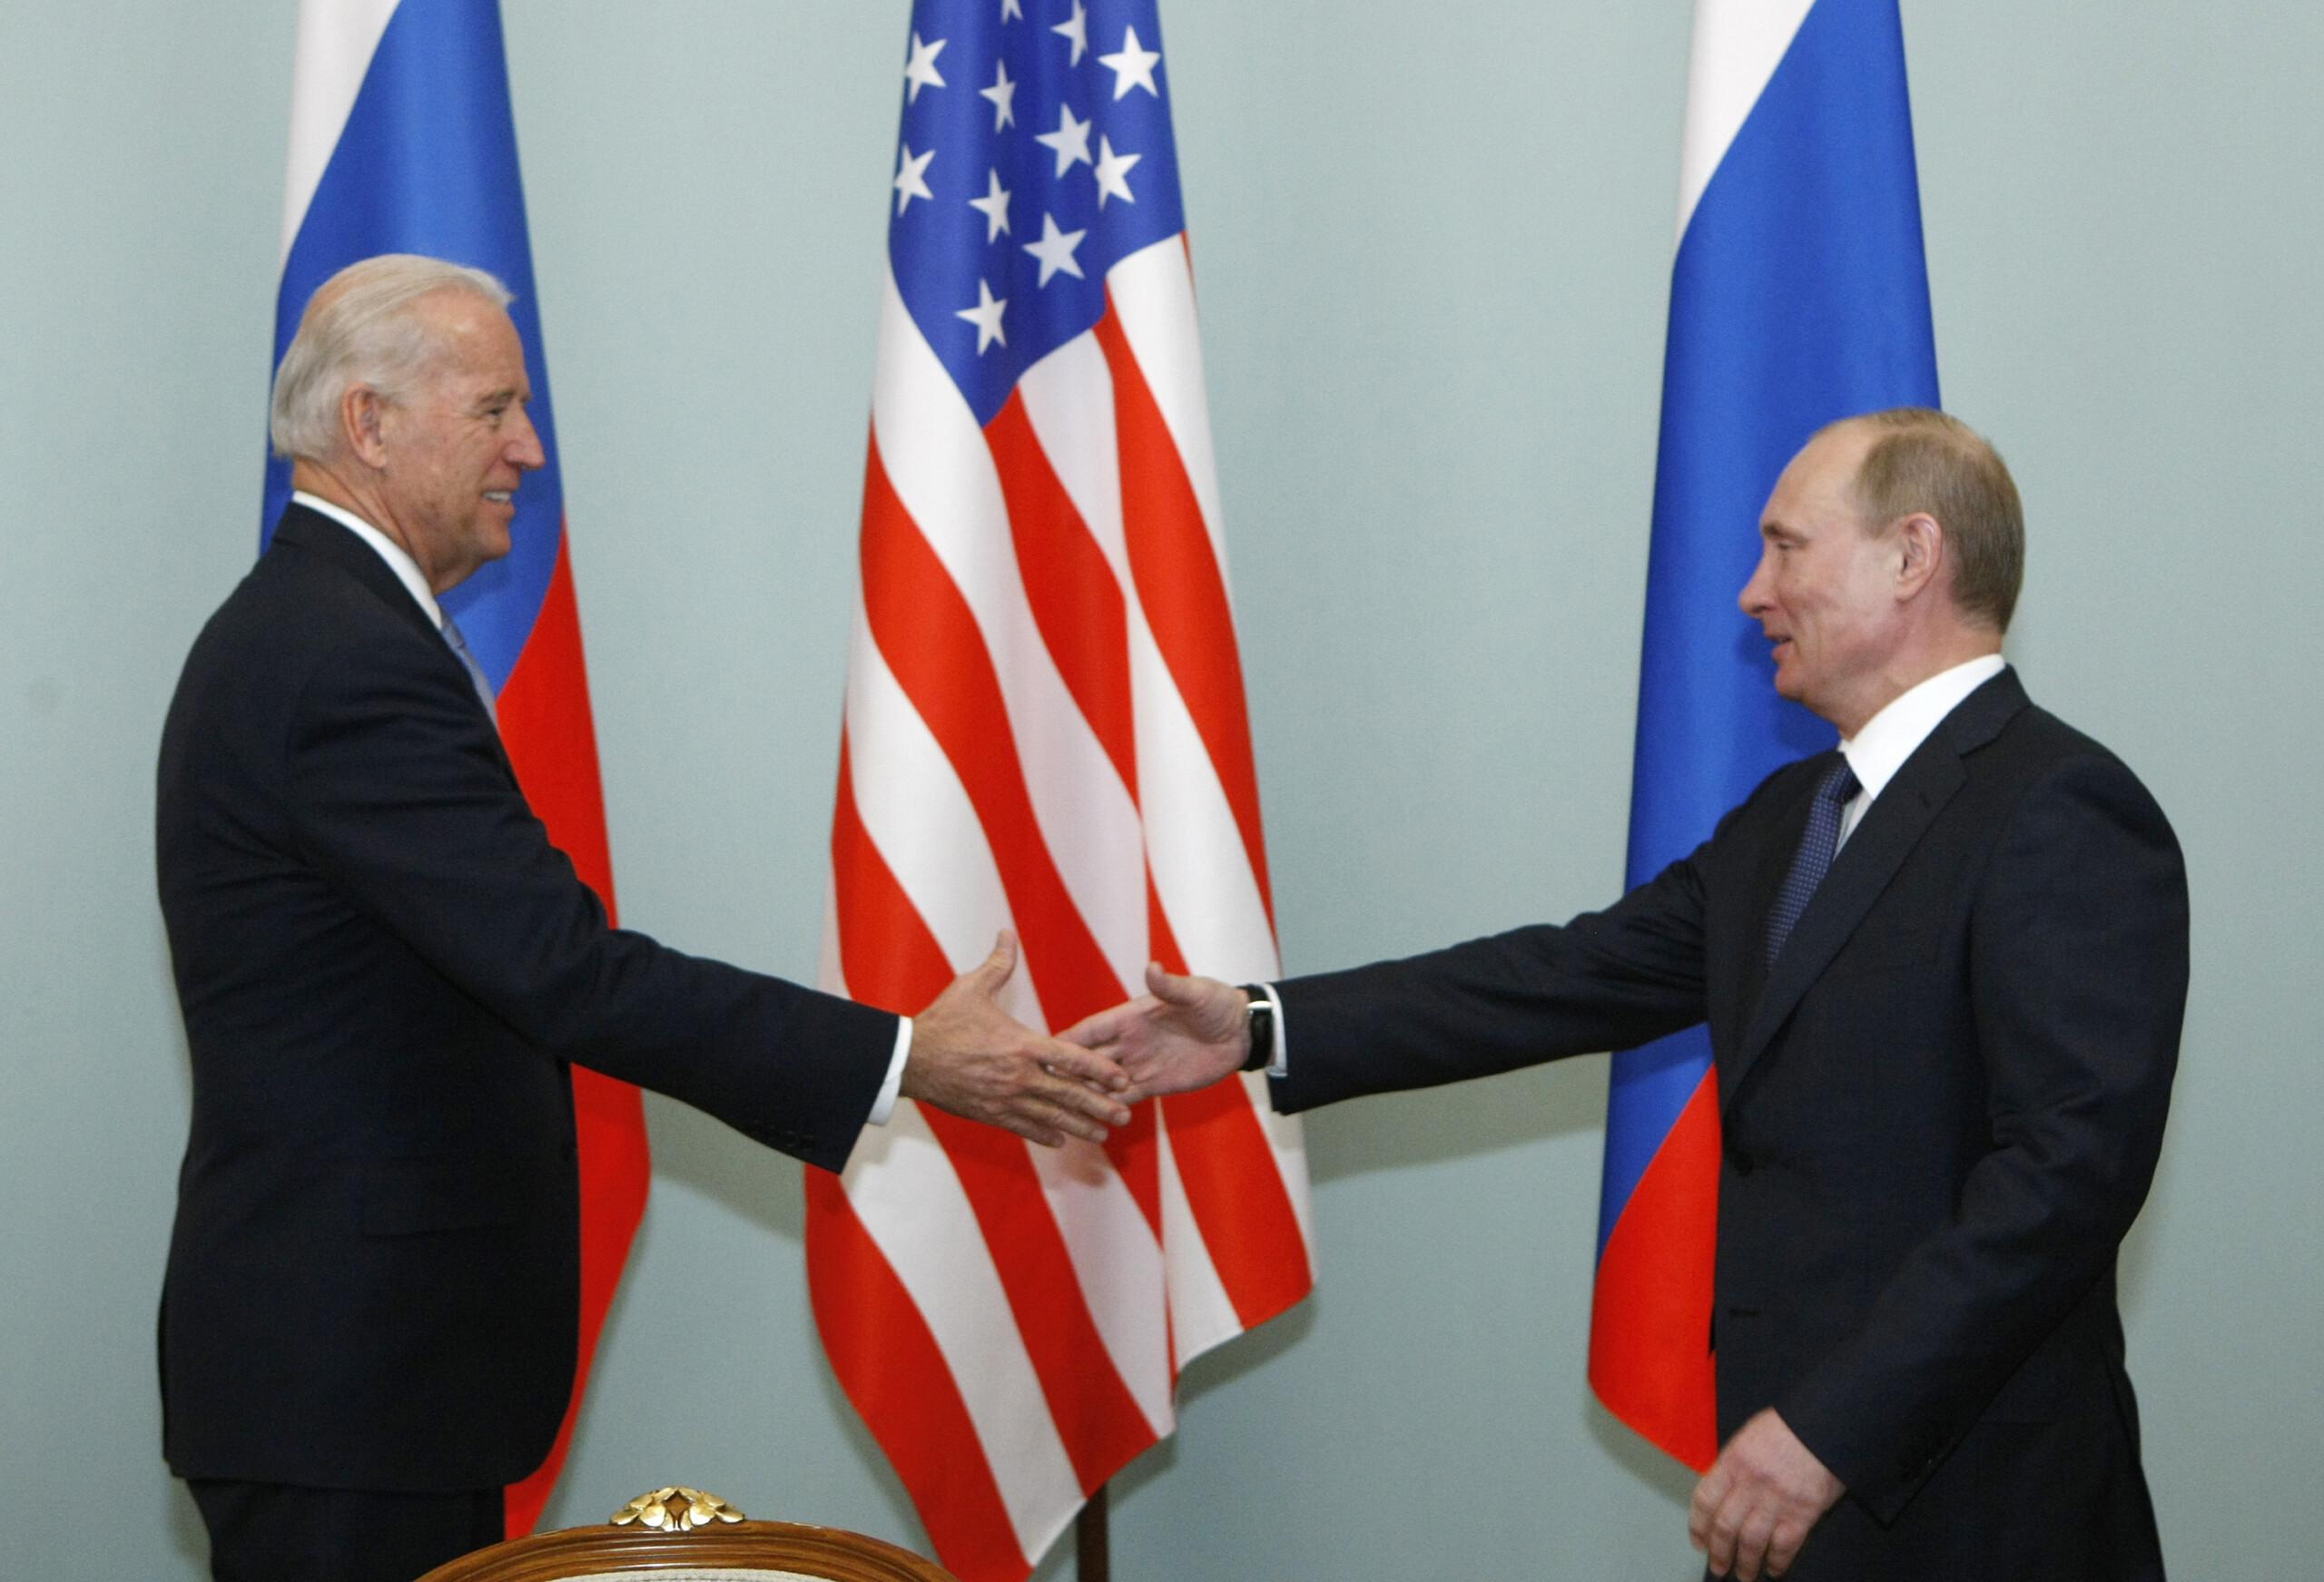 Russia's Putin congratulates Biden on winning U.S. election